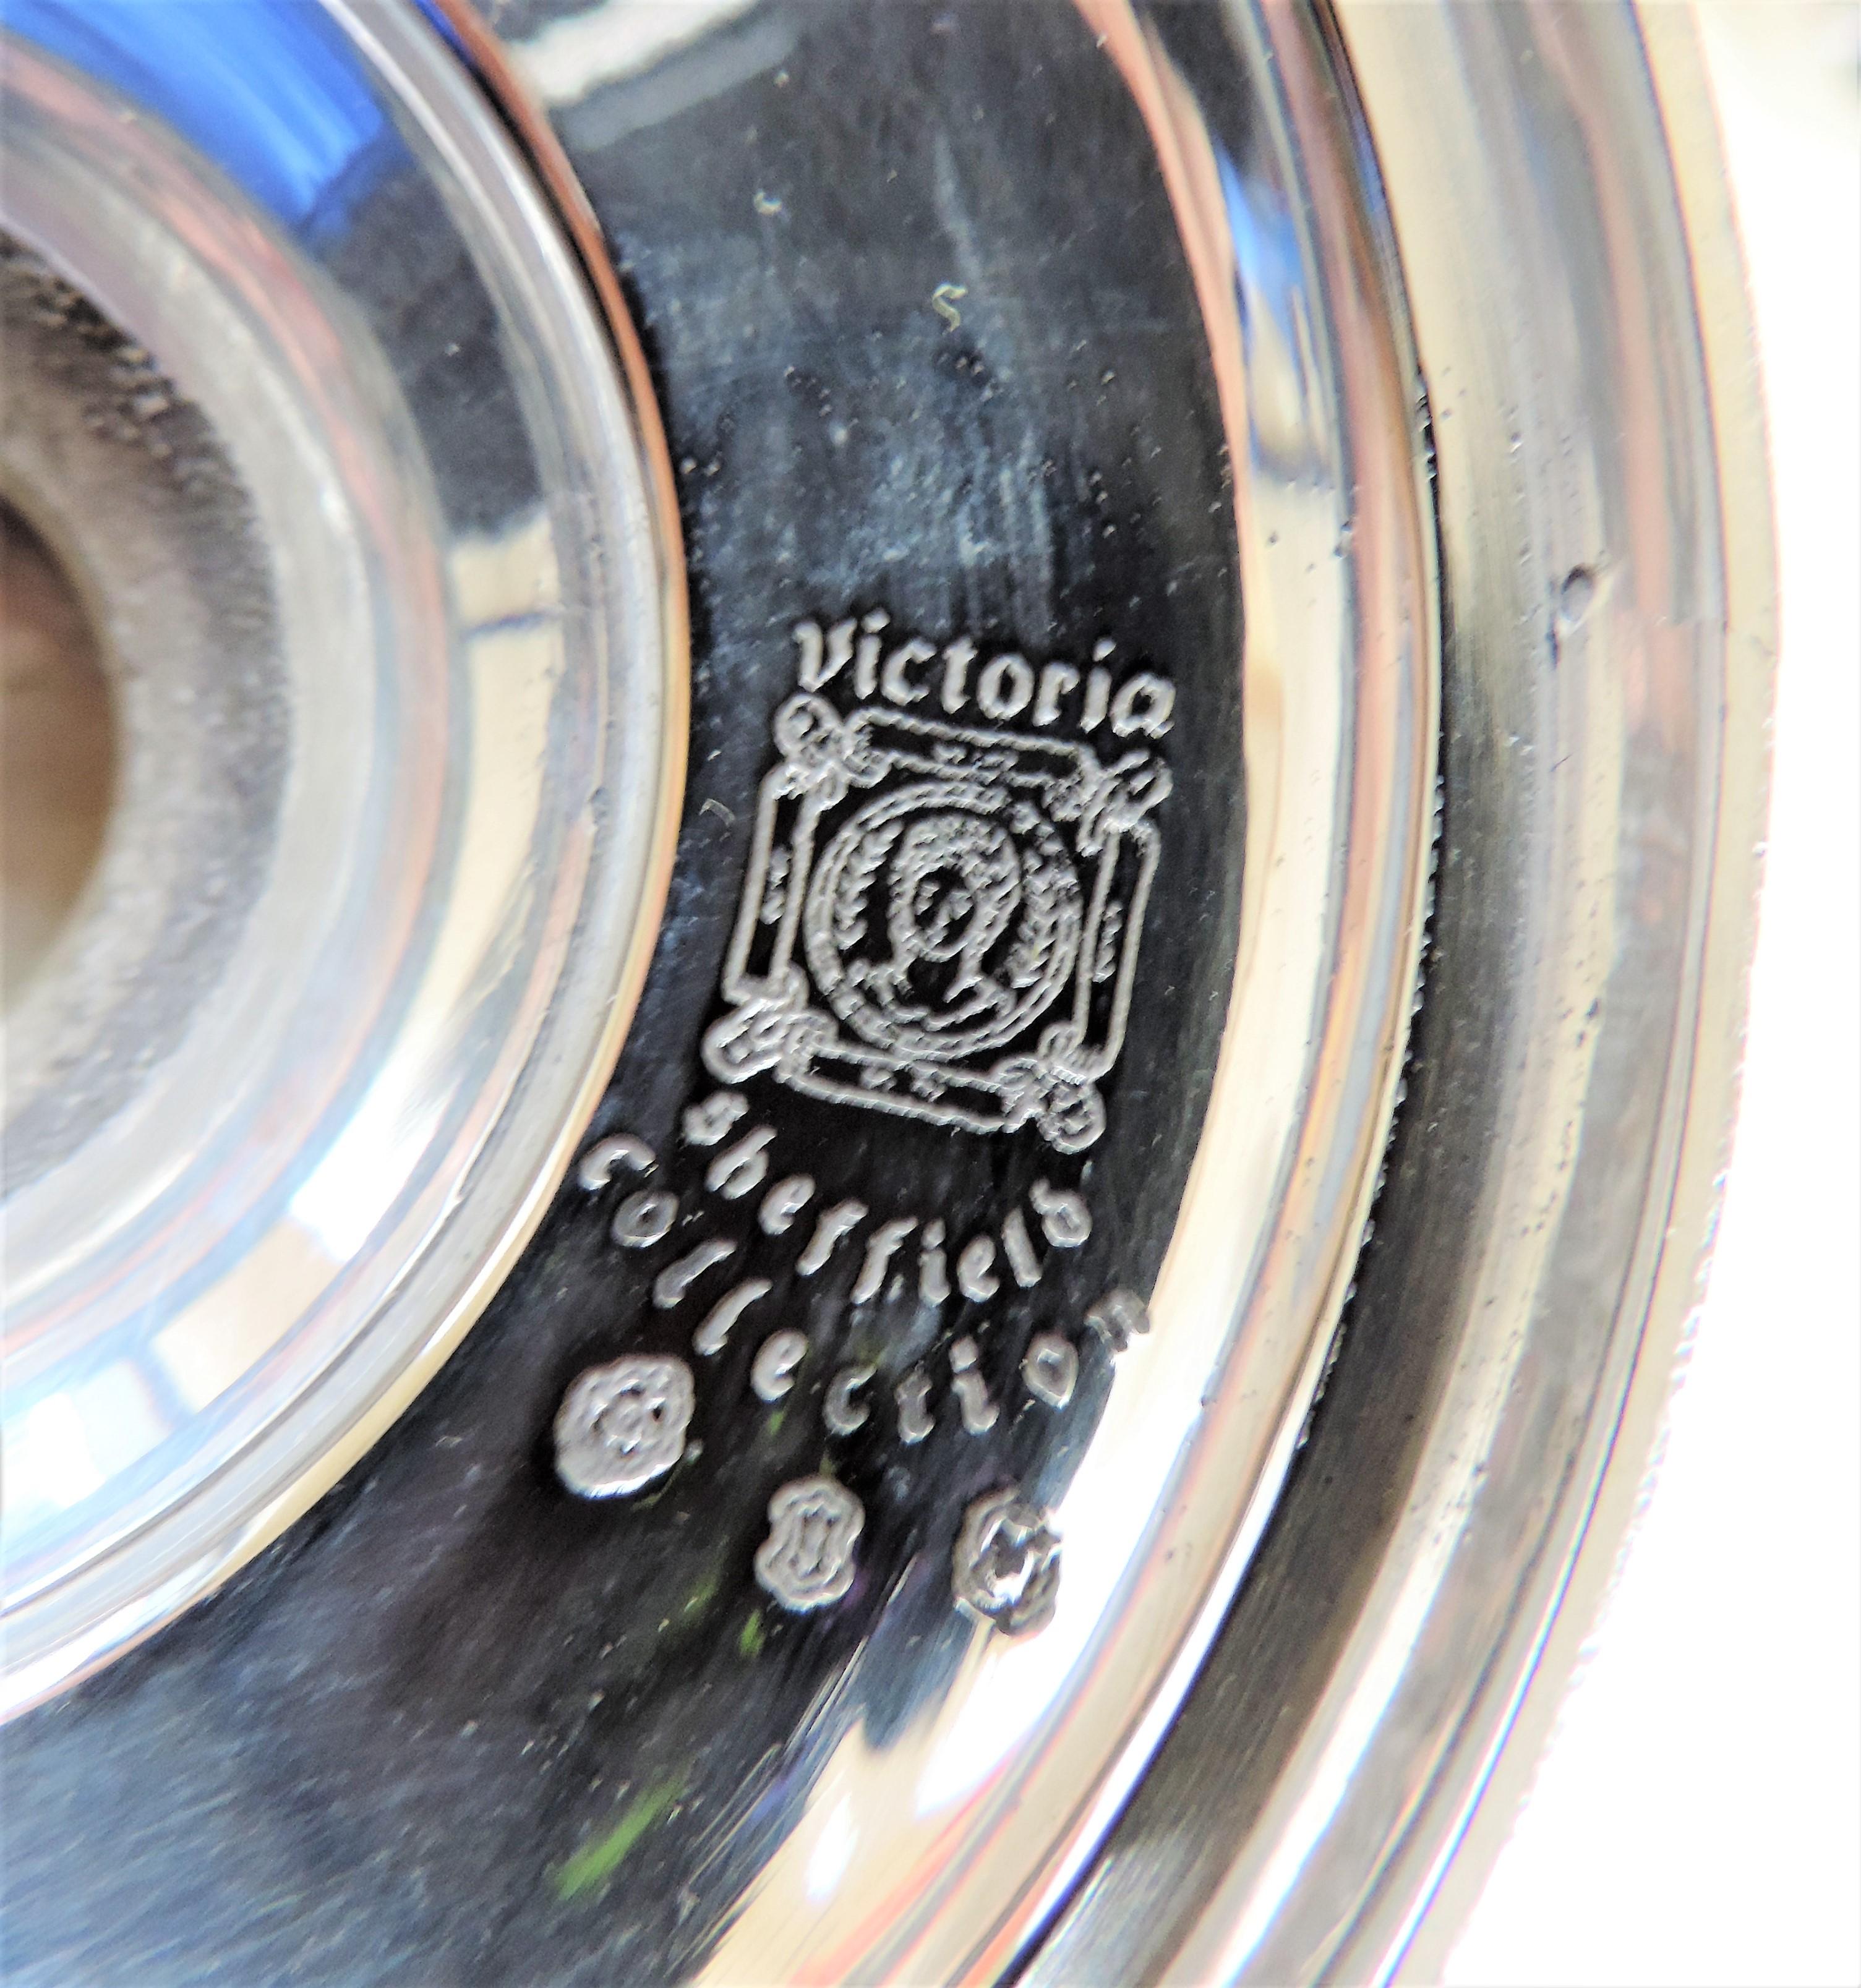 Antique Silver Plate Lidded Urn - Image 5 of 6